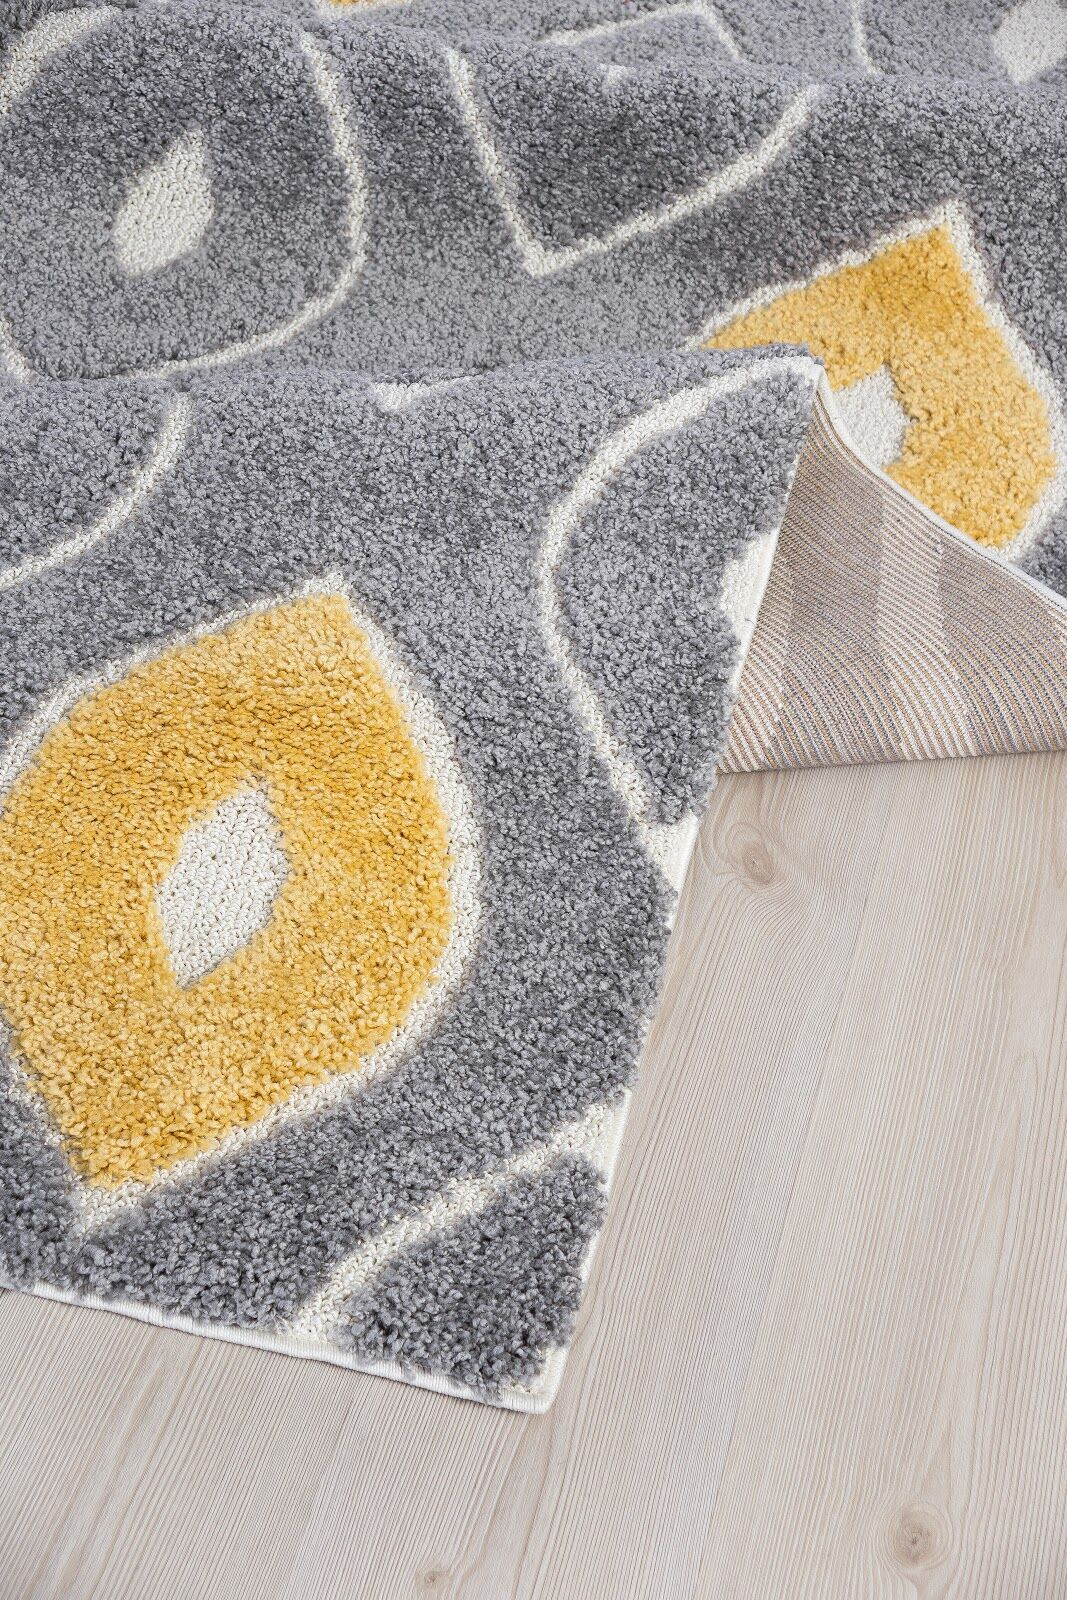 Ruiz Moroccan Shag Gray/Yellow Area Rug Rug Size: 6' x 6'